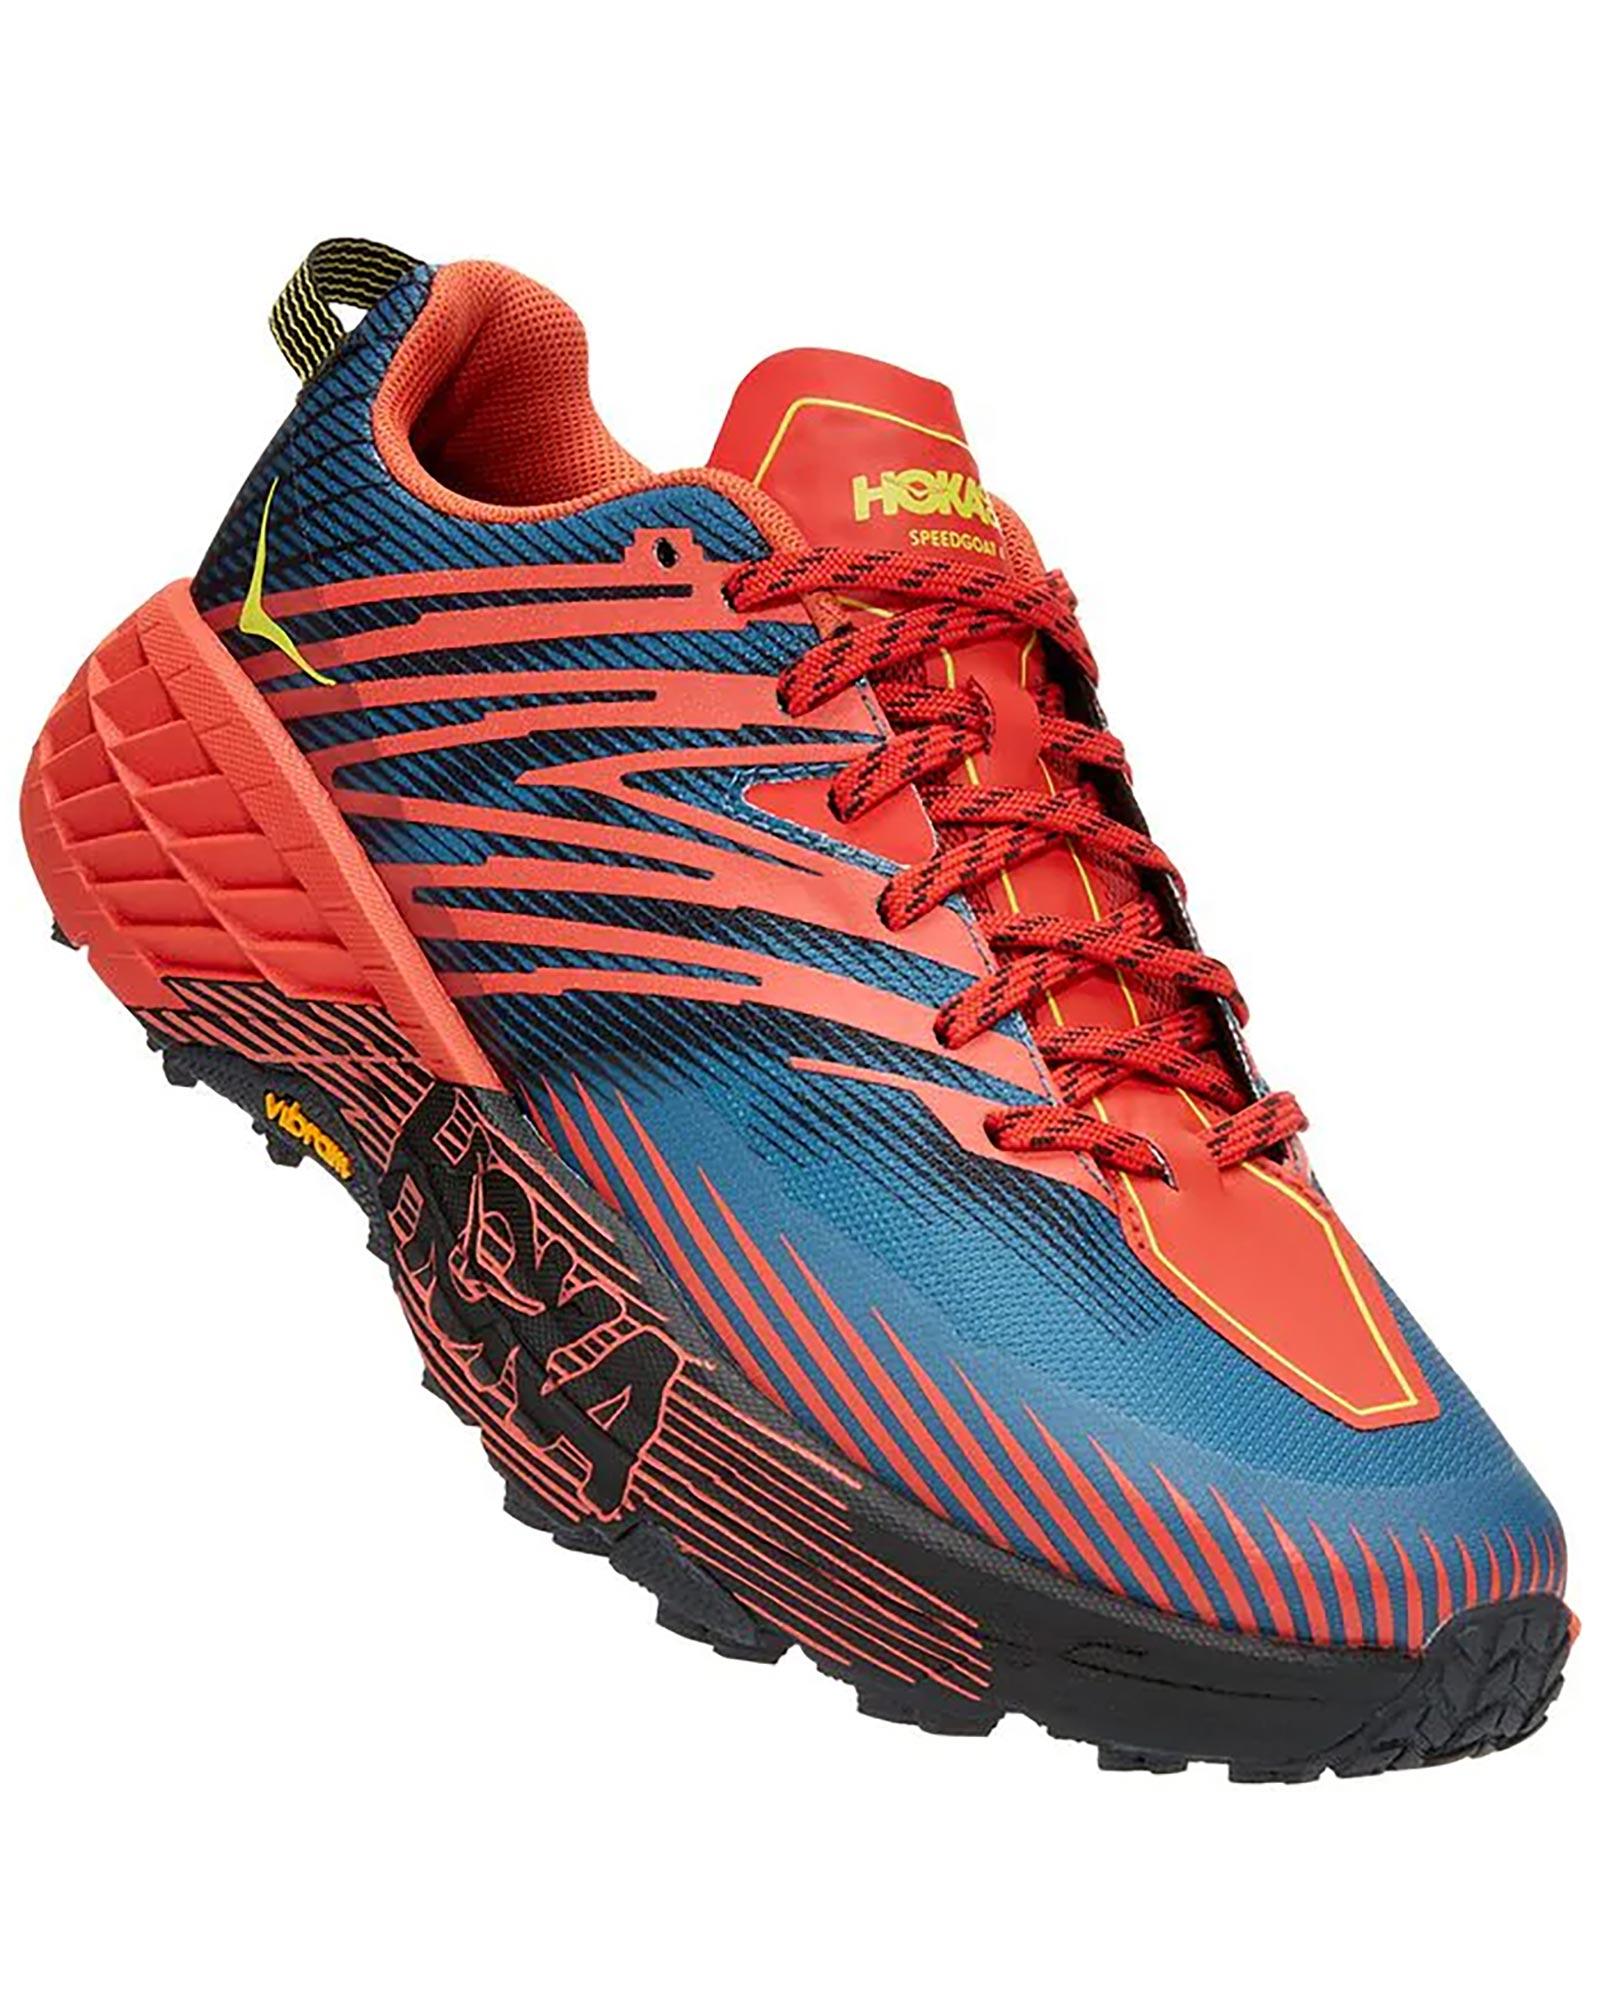 Hoka One One Speedgoat 4 Men's Shoes 0